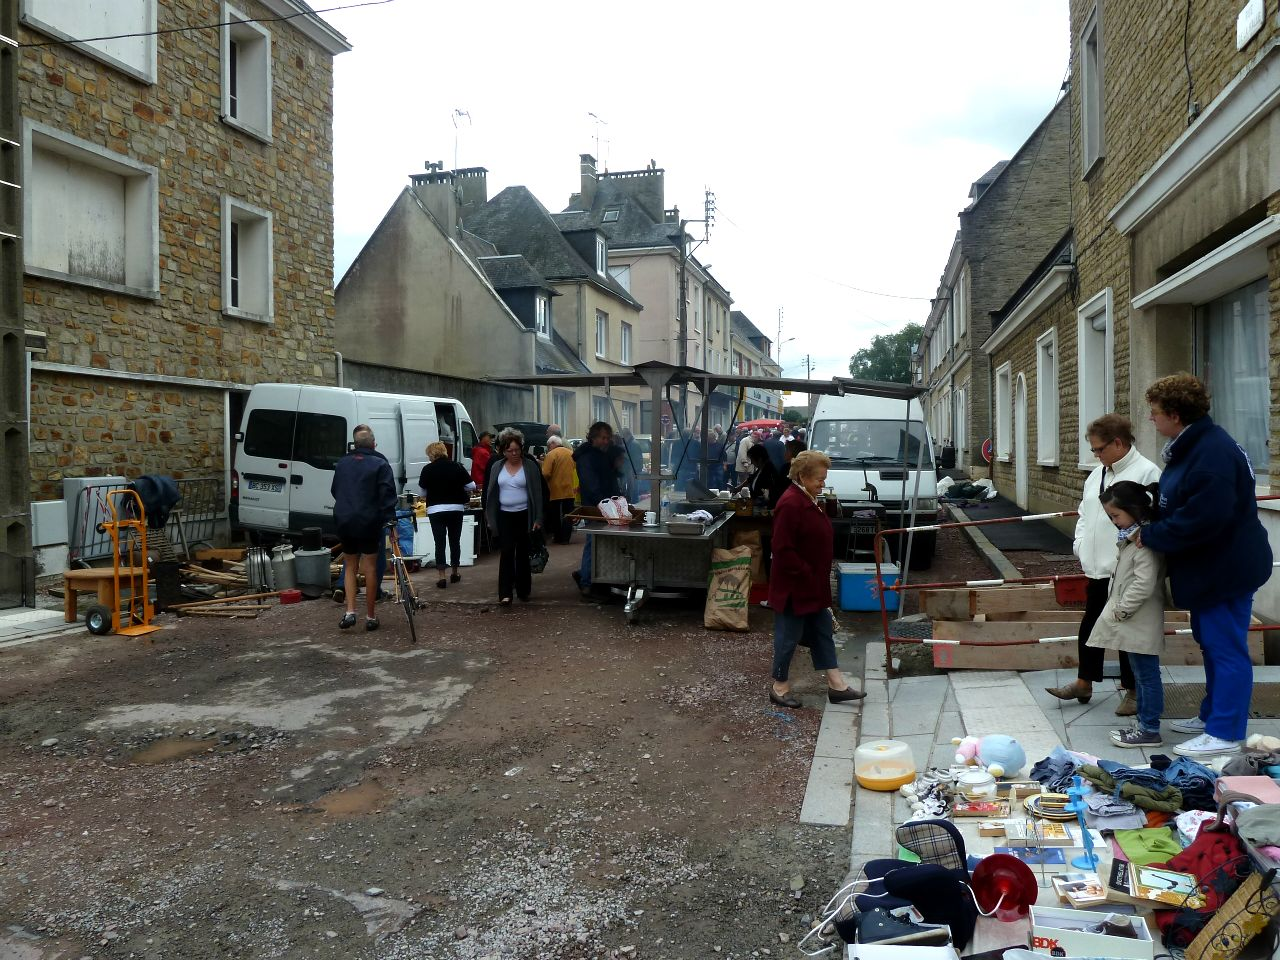 8 la commune vide grenier in the rain part 2. Black Bedroom Furniture Sets. Home Design Ideas